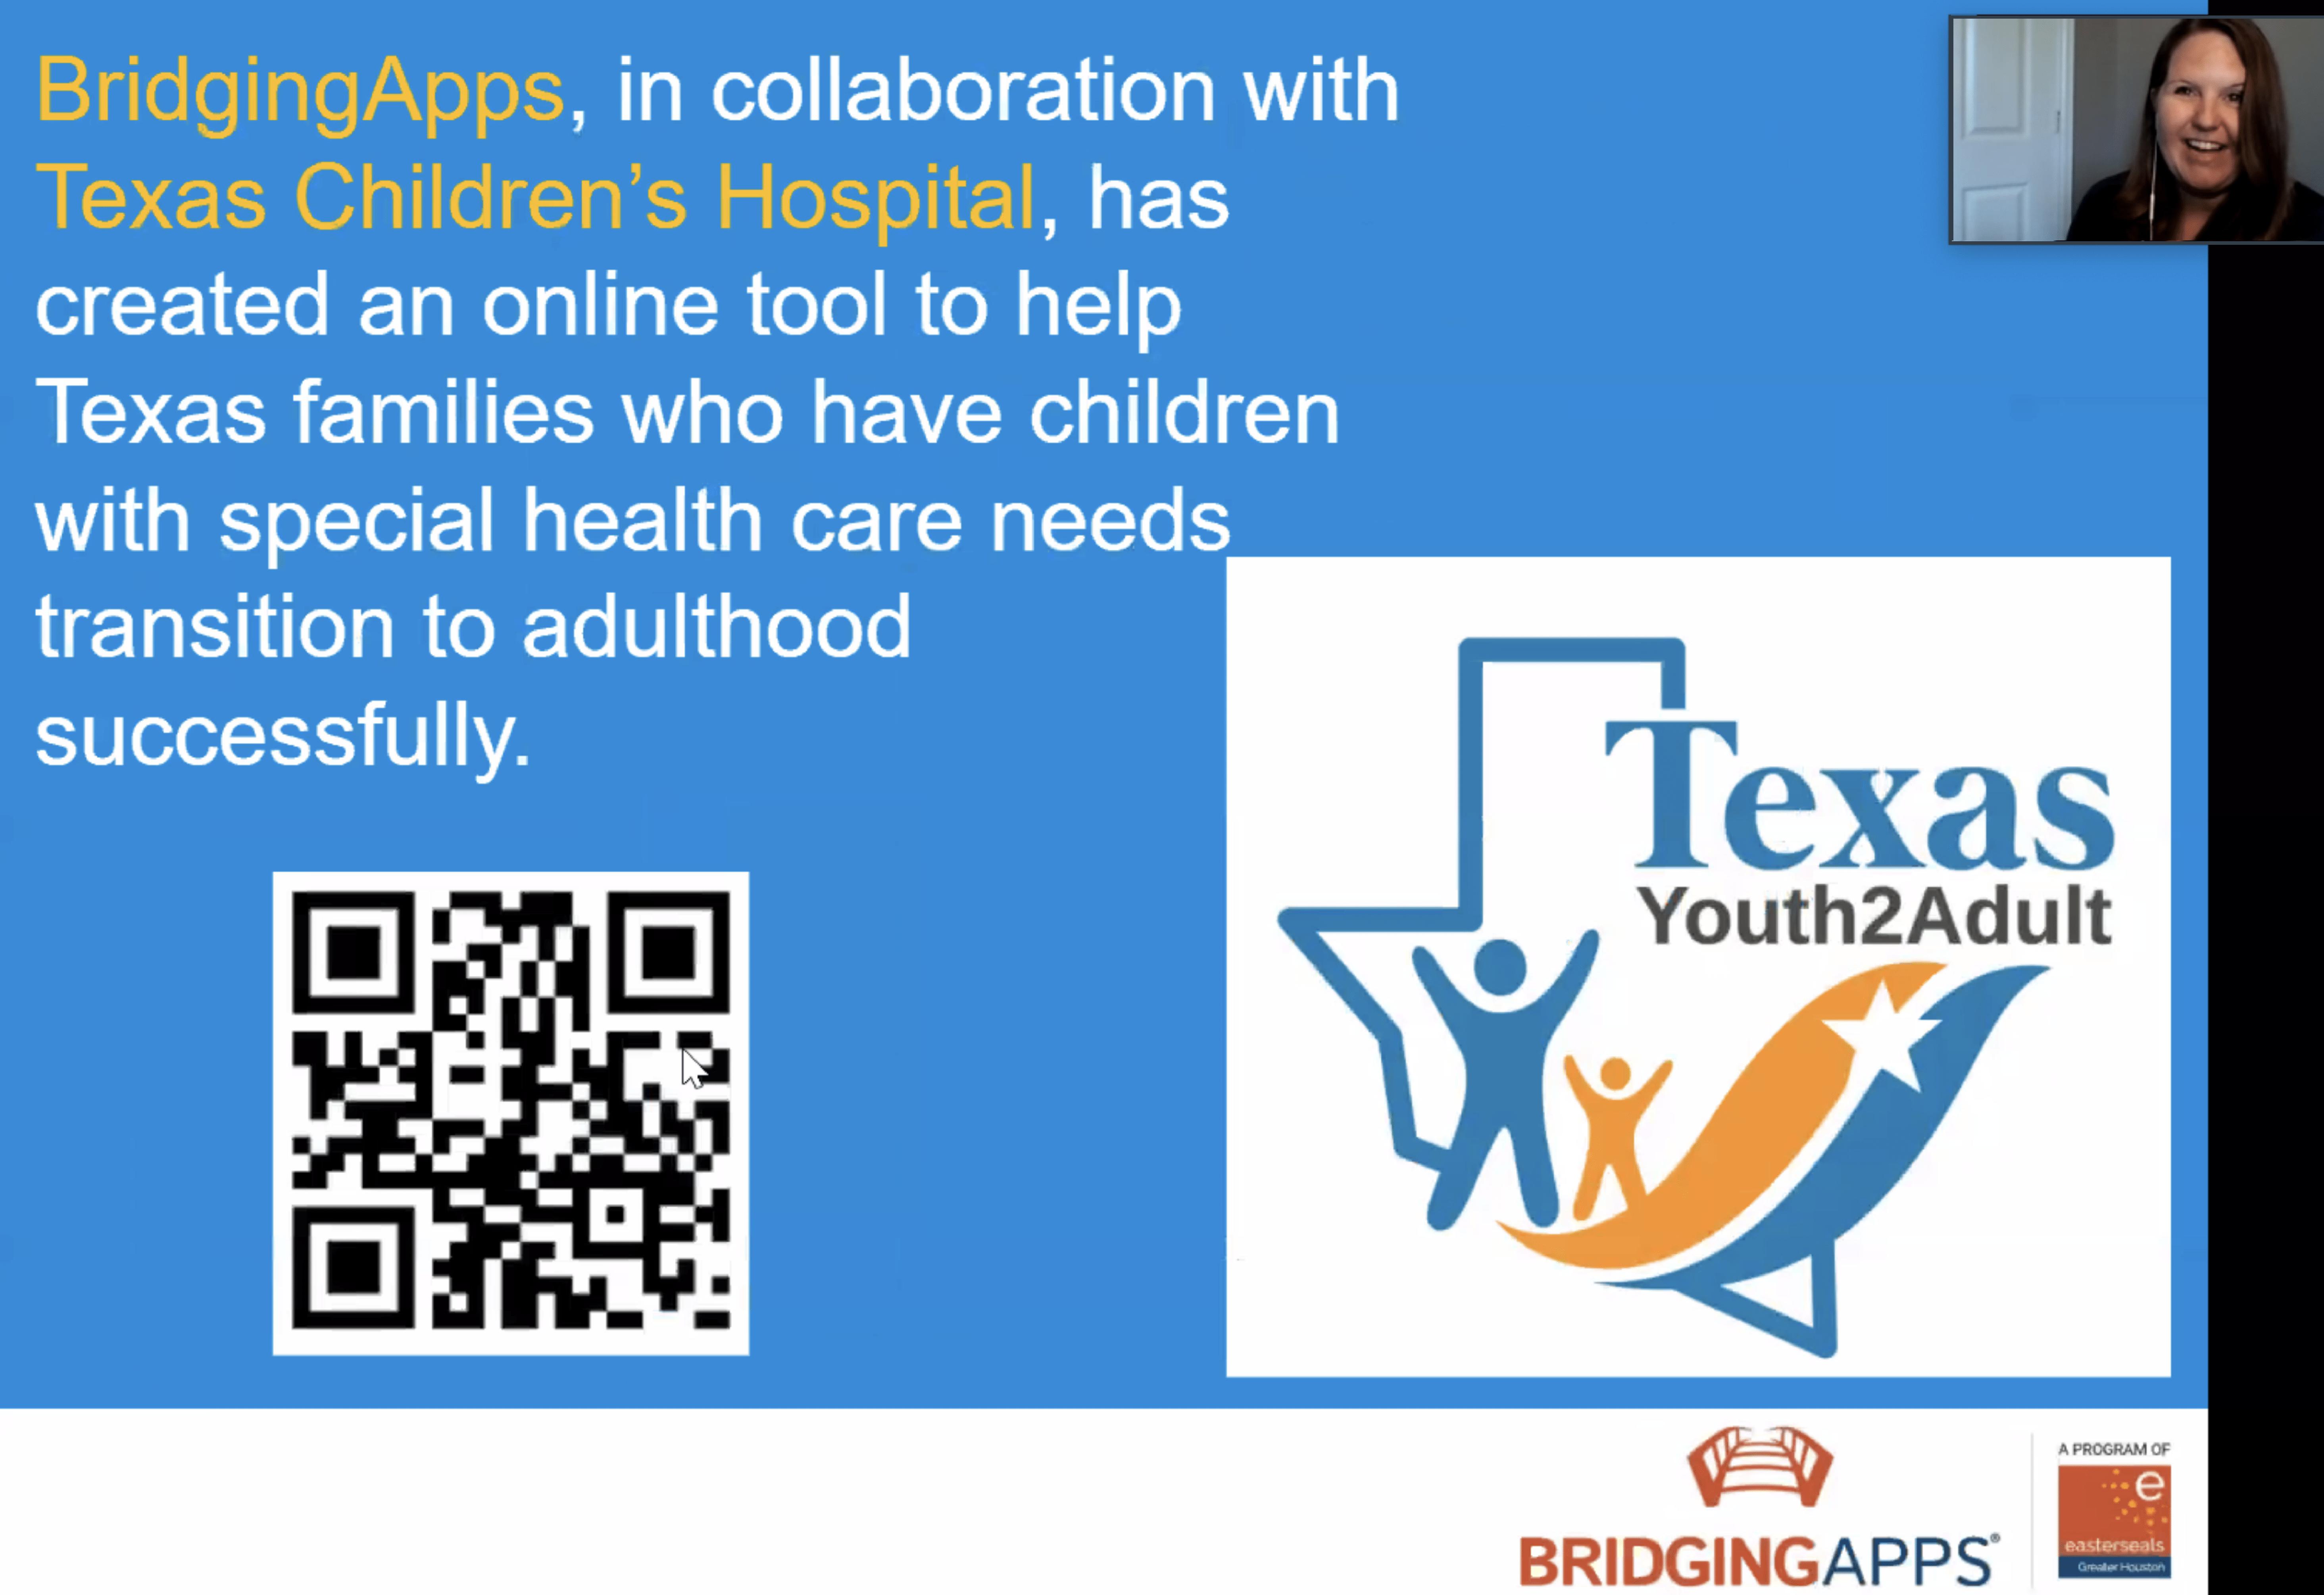 BridgingApps' Amy Fuchs giving a presentation over TexasYouth2Adult